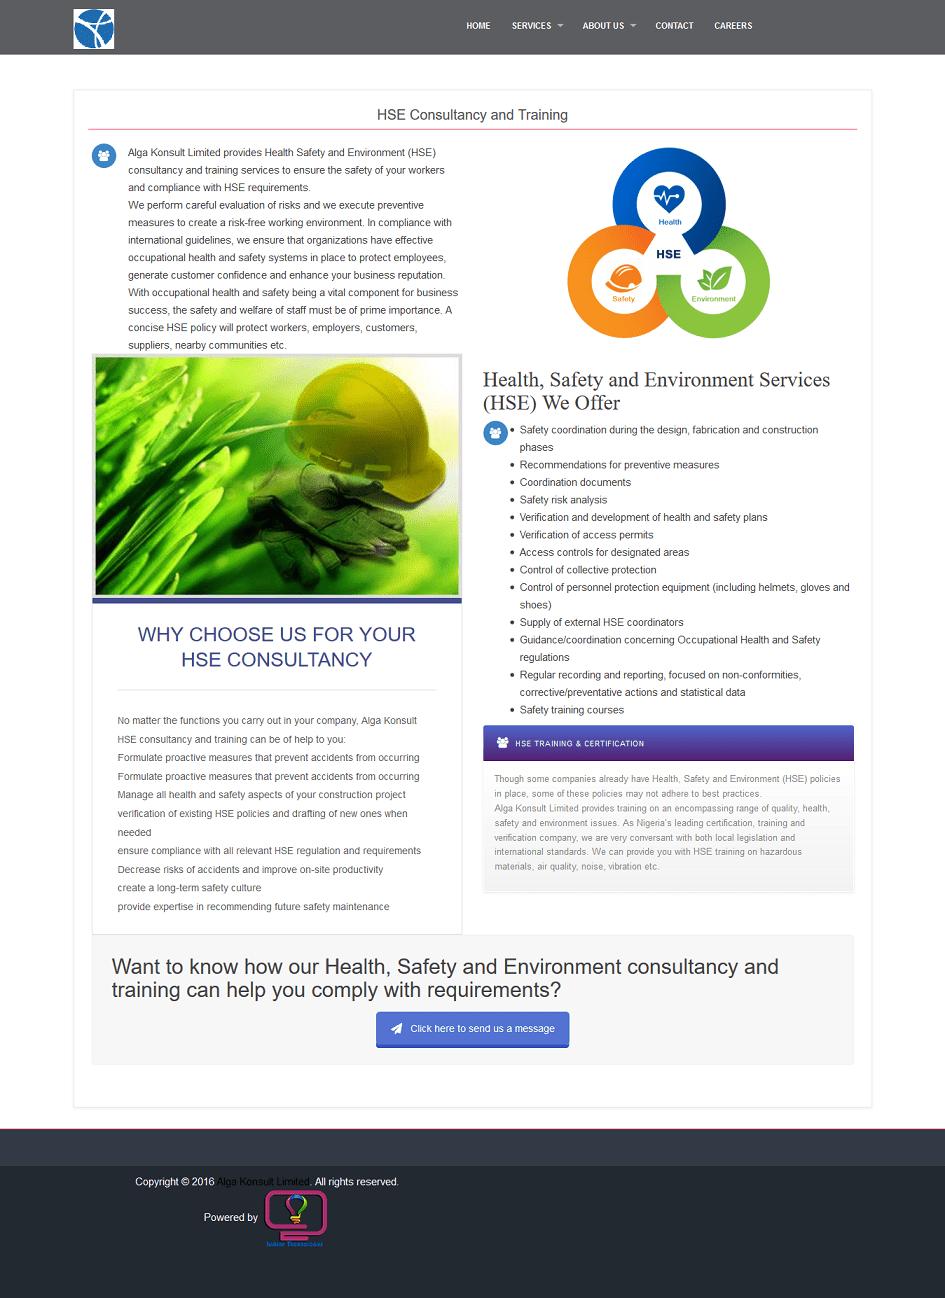 alga konsult web design 2